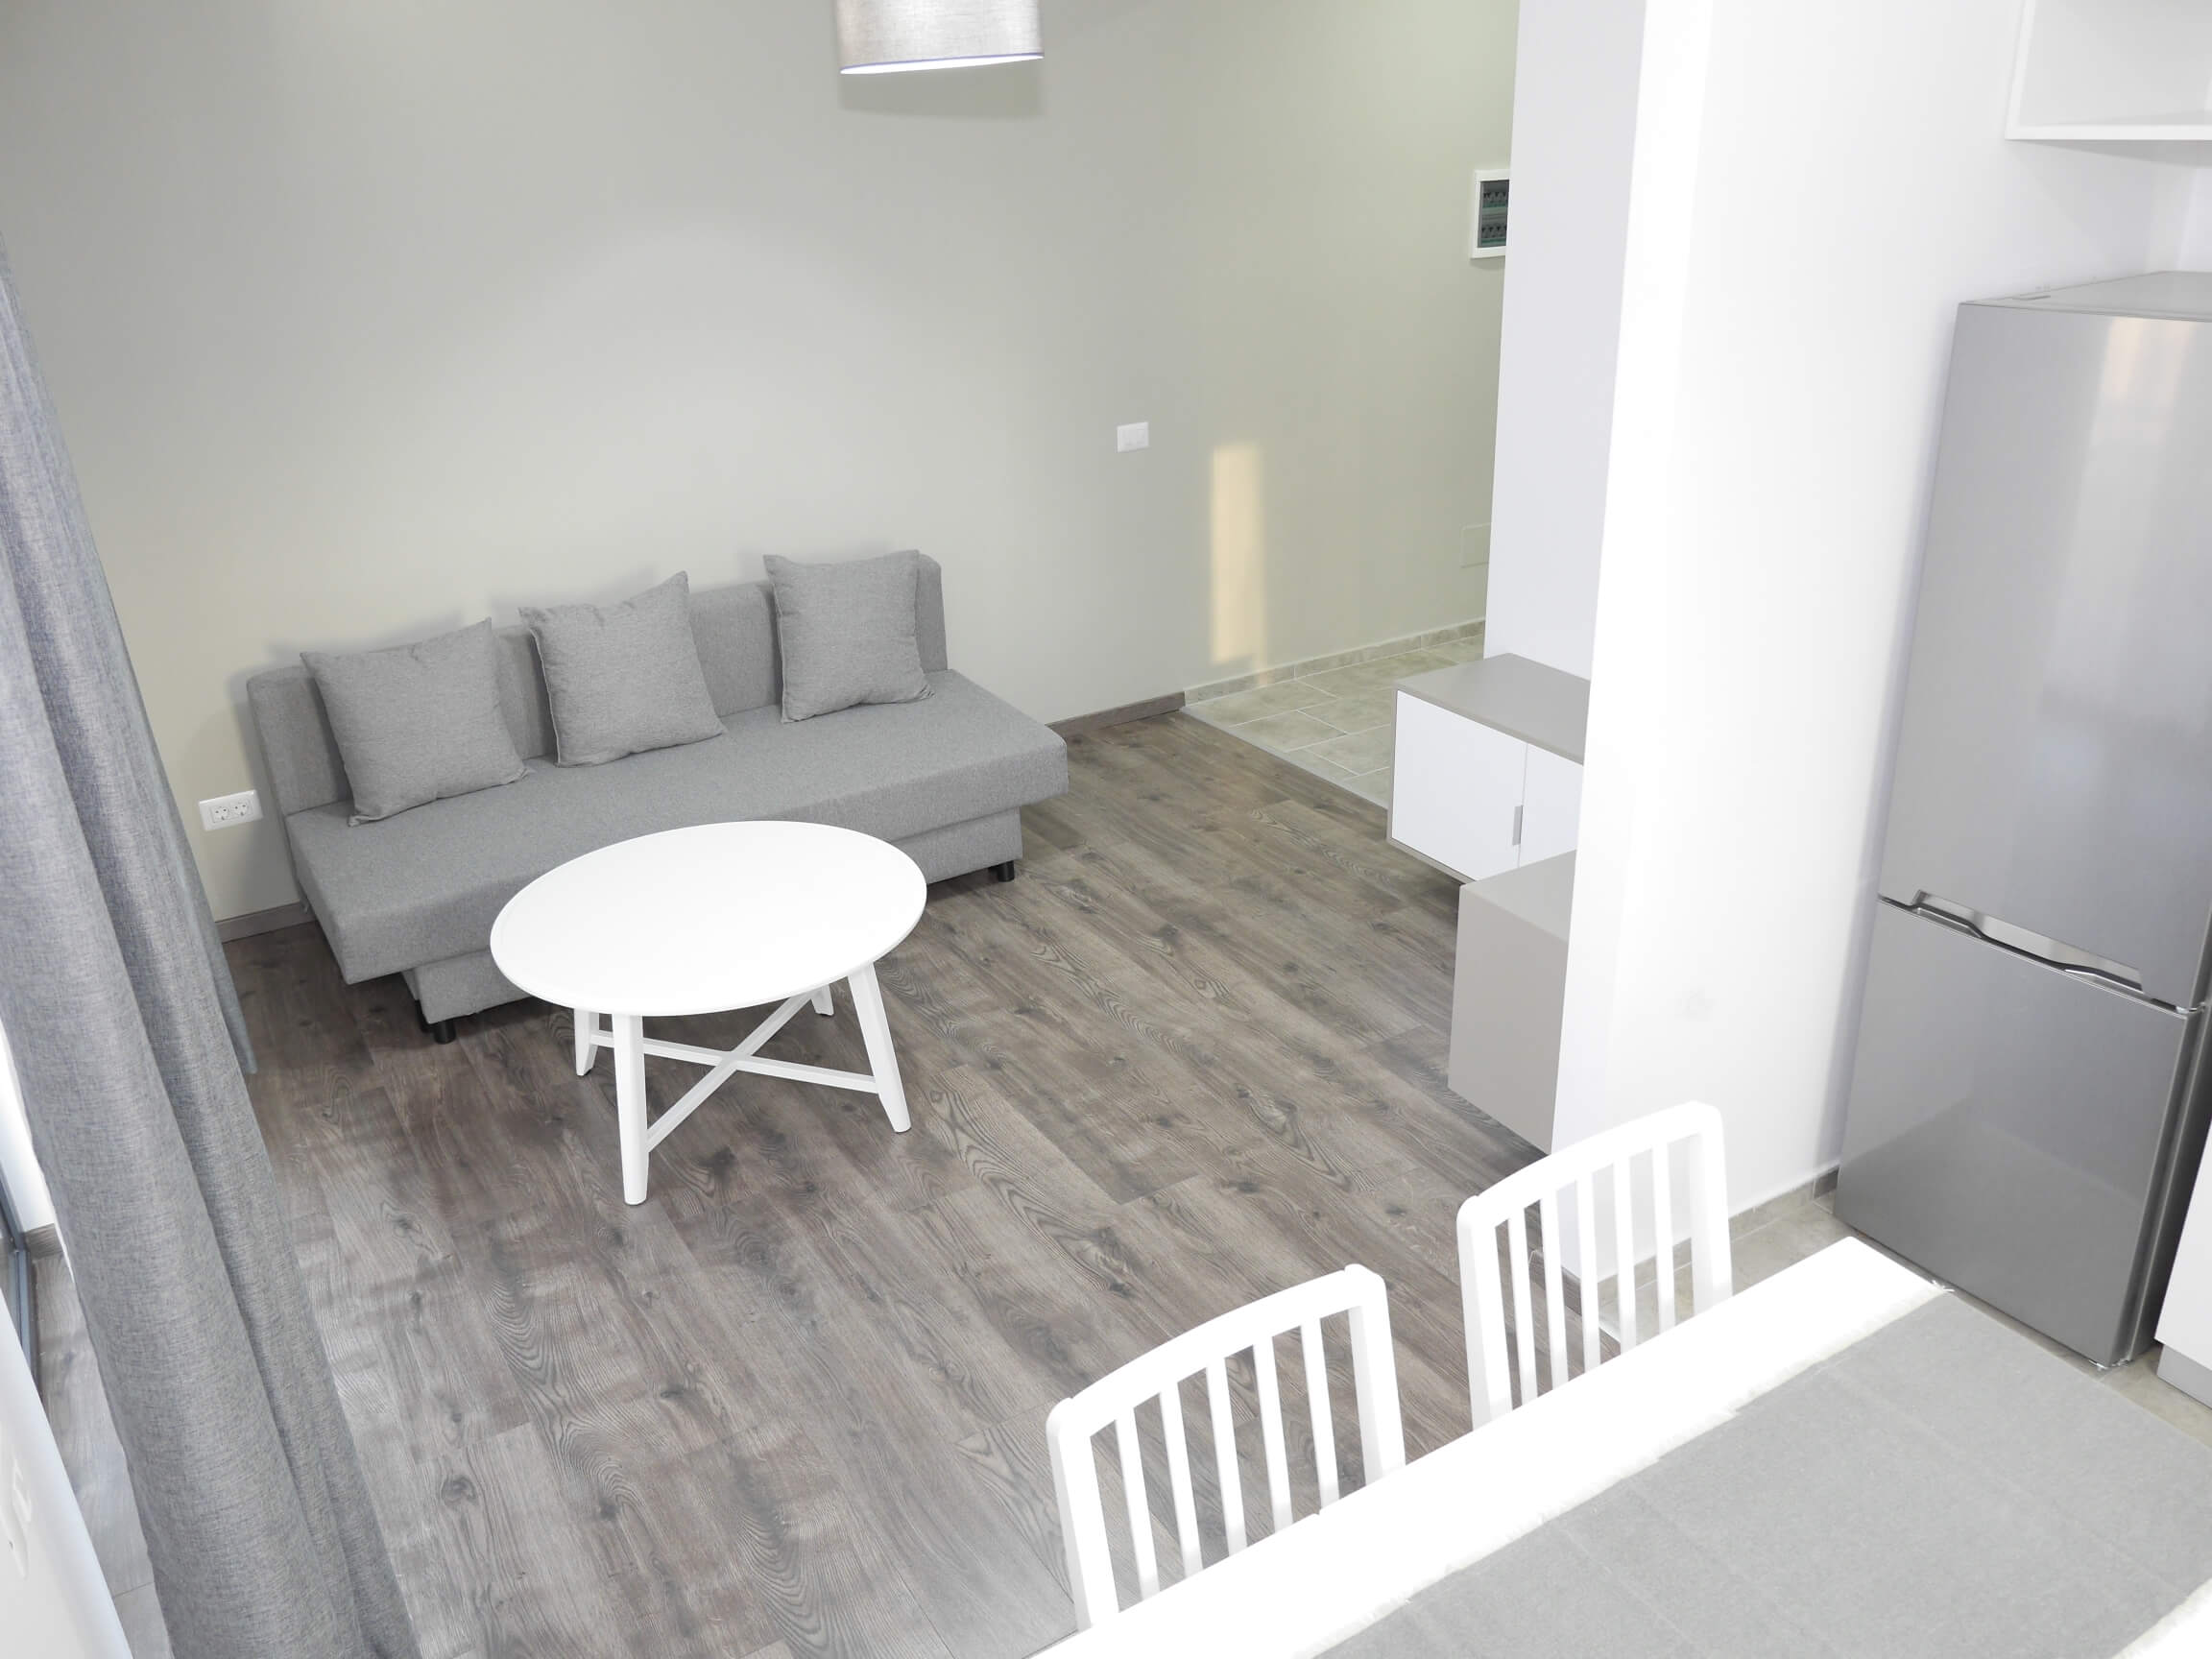 Clement Apartments - Cazare Neamt - Cazare Piatra Neamt - Apartamente de inchiriat in regim hotelier (31)